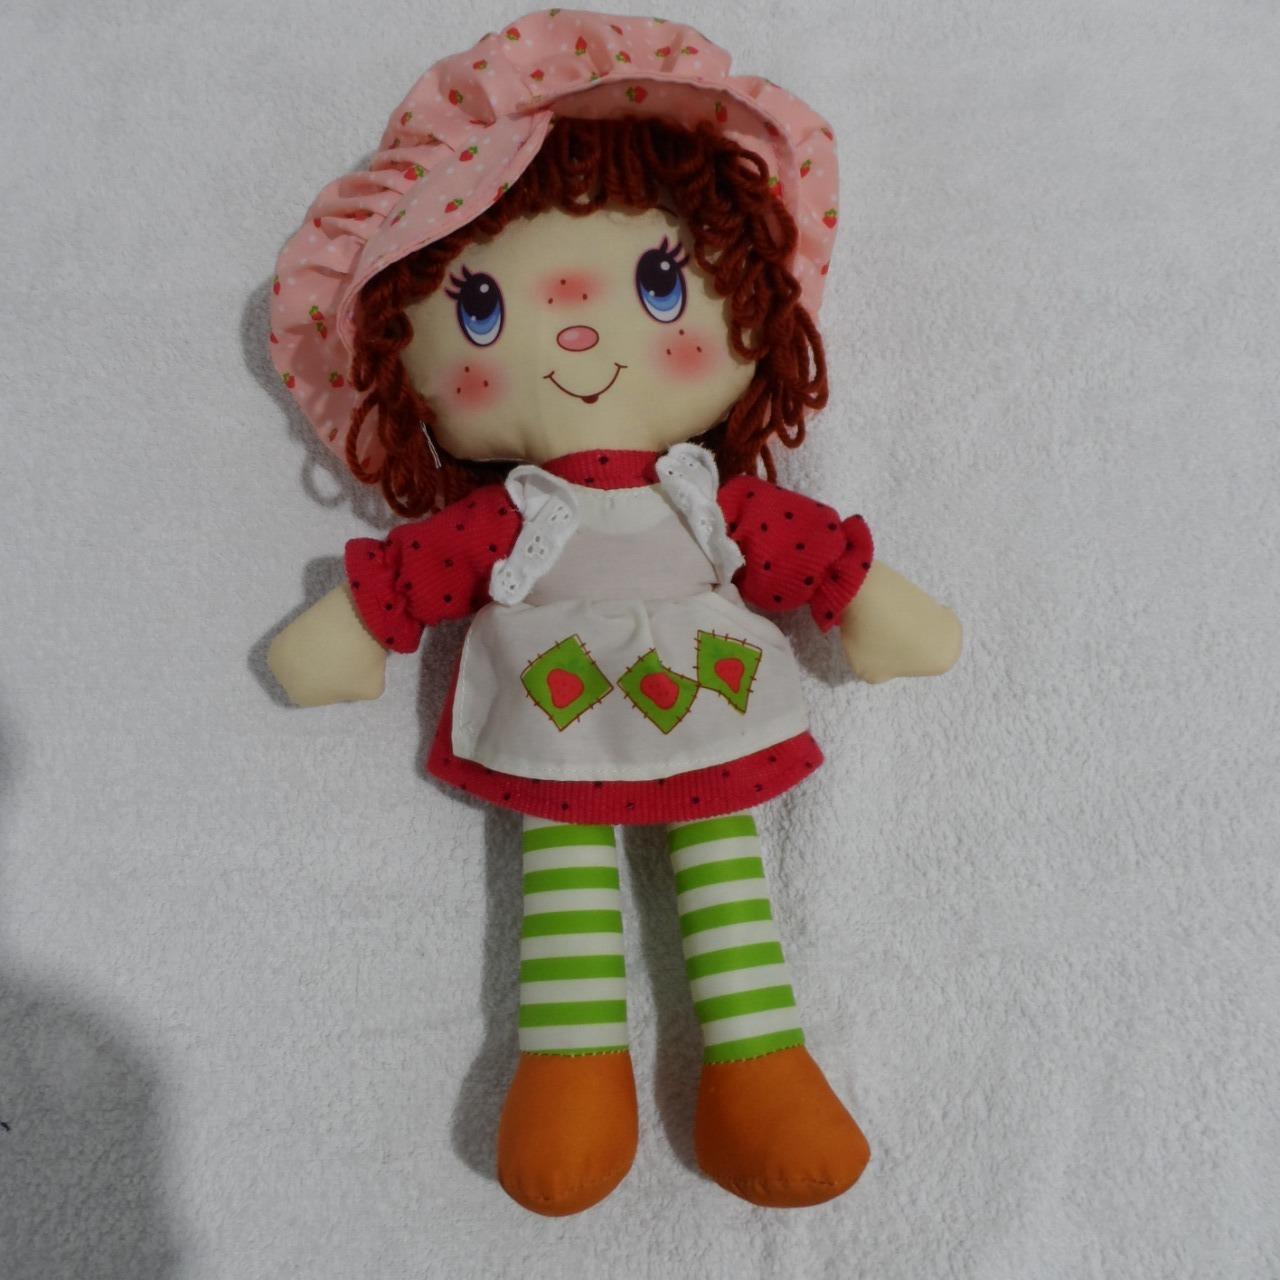 Kids Multicoloured Strawberry Shortcake Doll